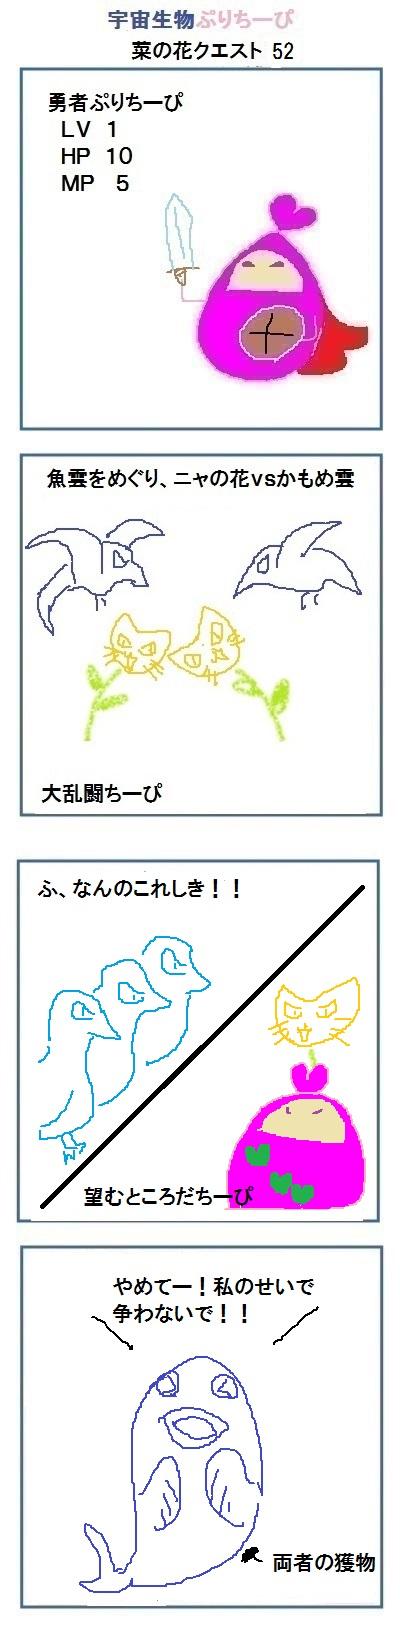 160529_nanohana_quest52.jpg